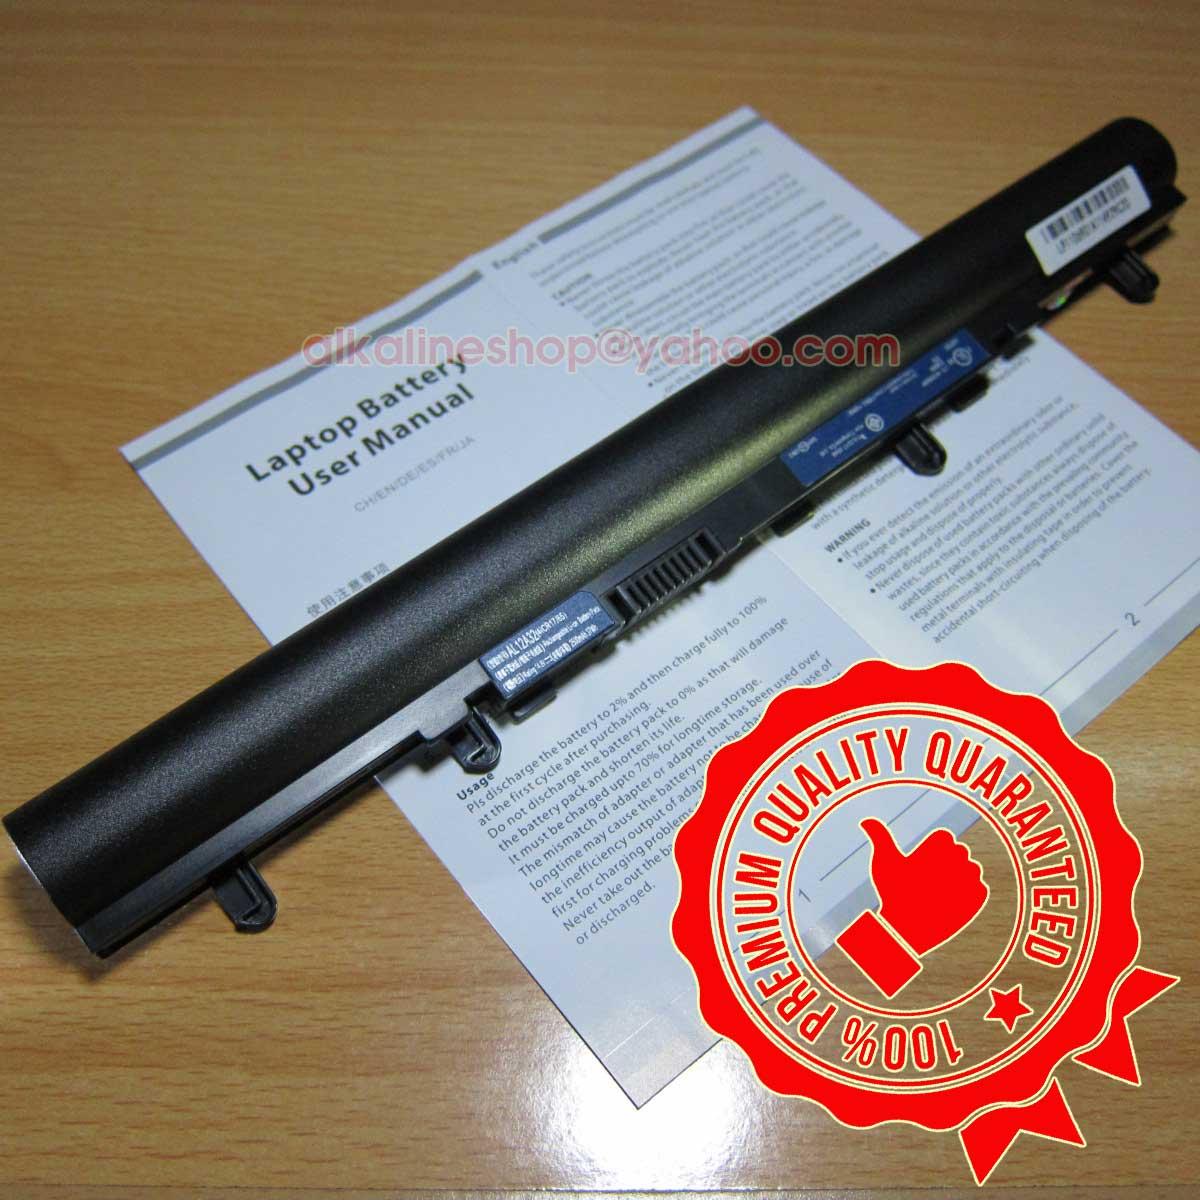 Jual Original Baterai Acer Aspire V5 471 431 531 571 Laptop 431g 471g Alkalineshop Tokopedia